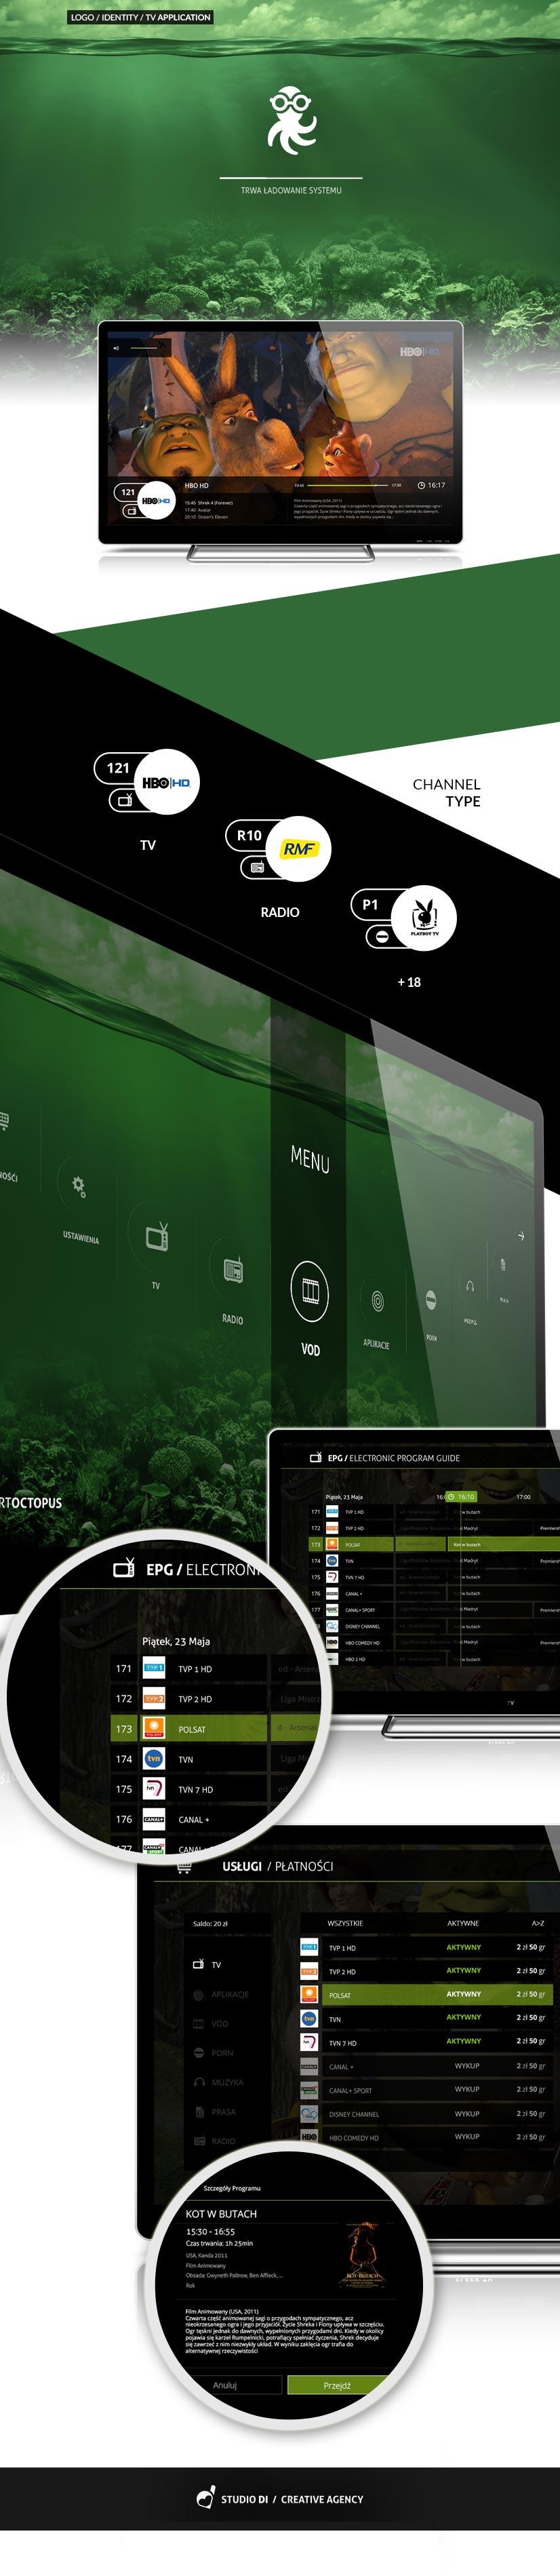 smartoctopus-projekt-graficzny